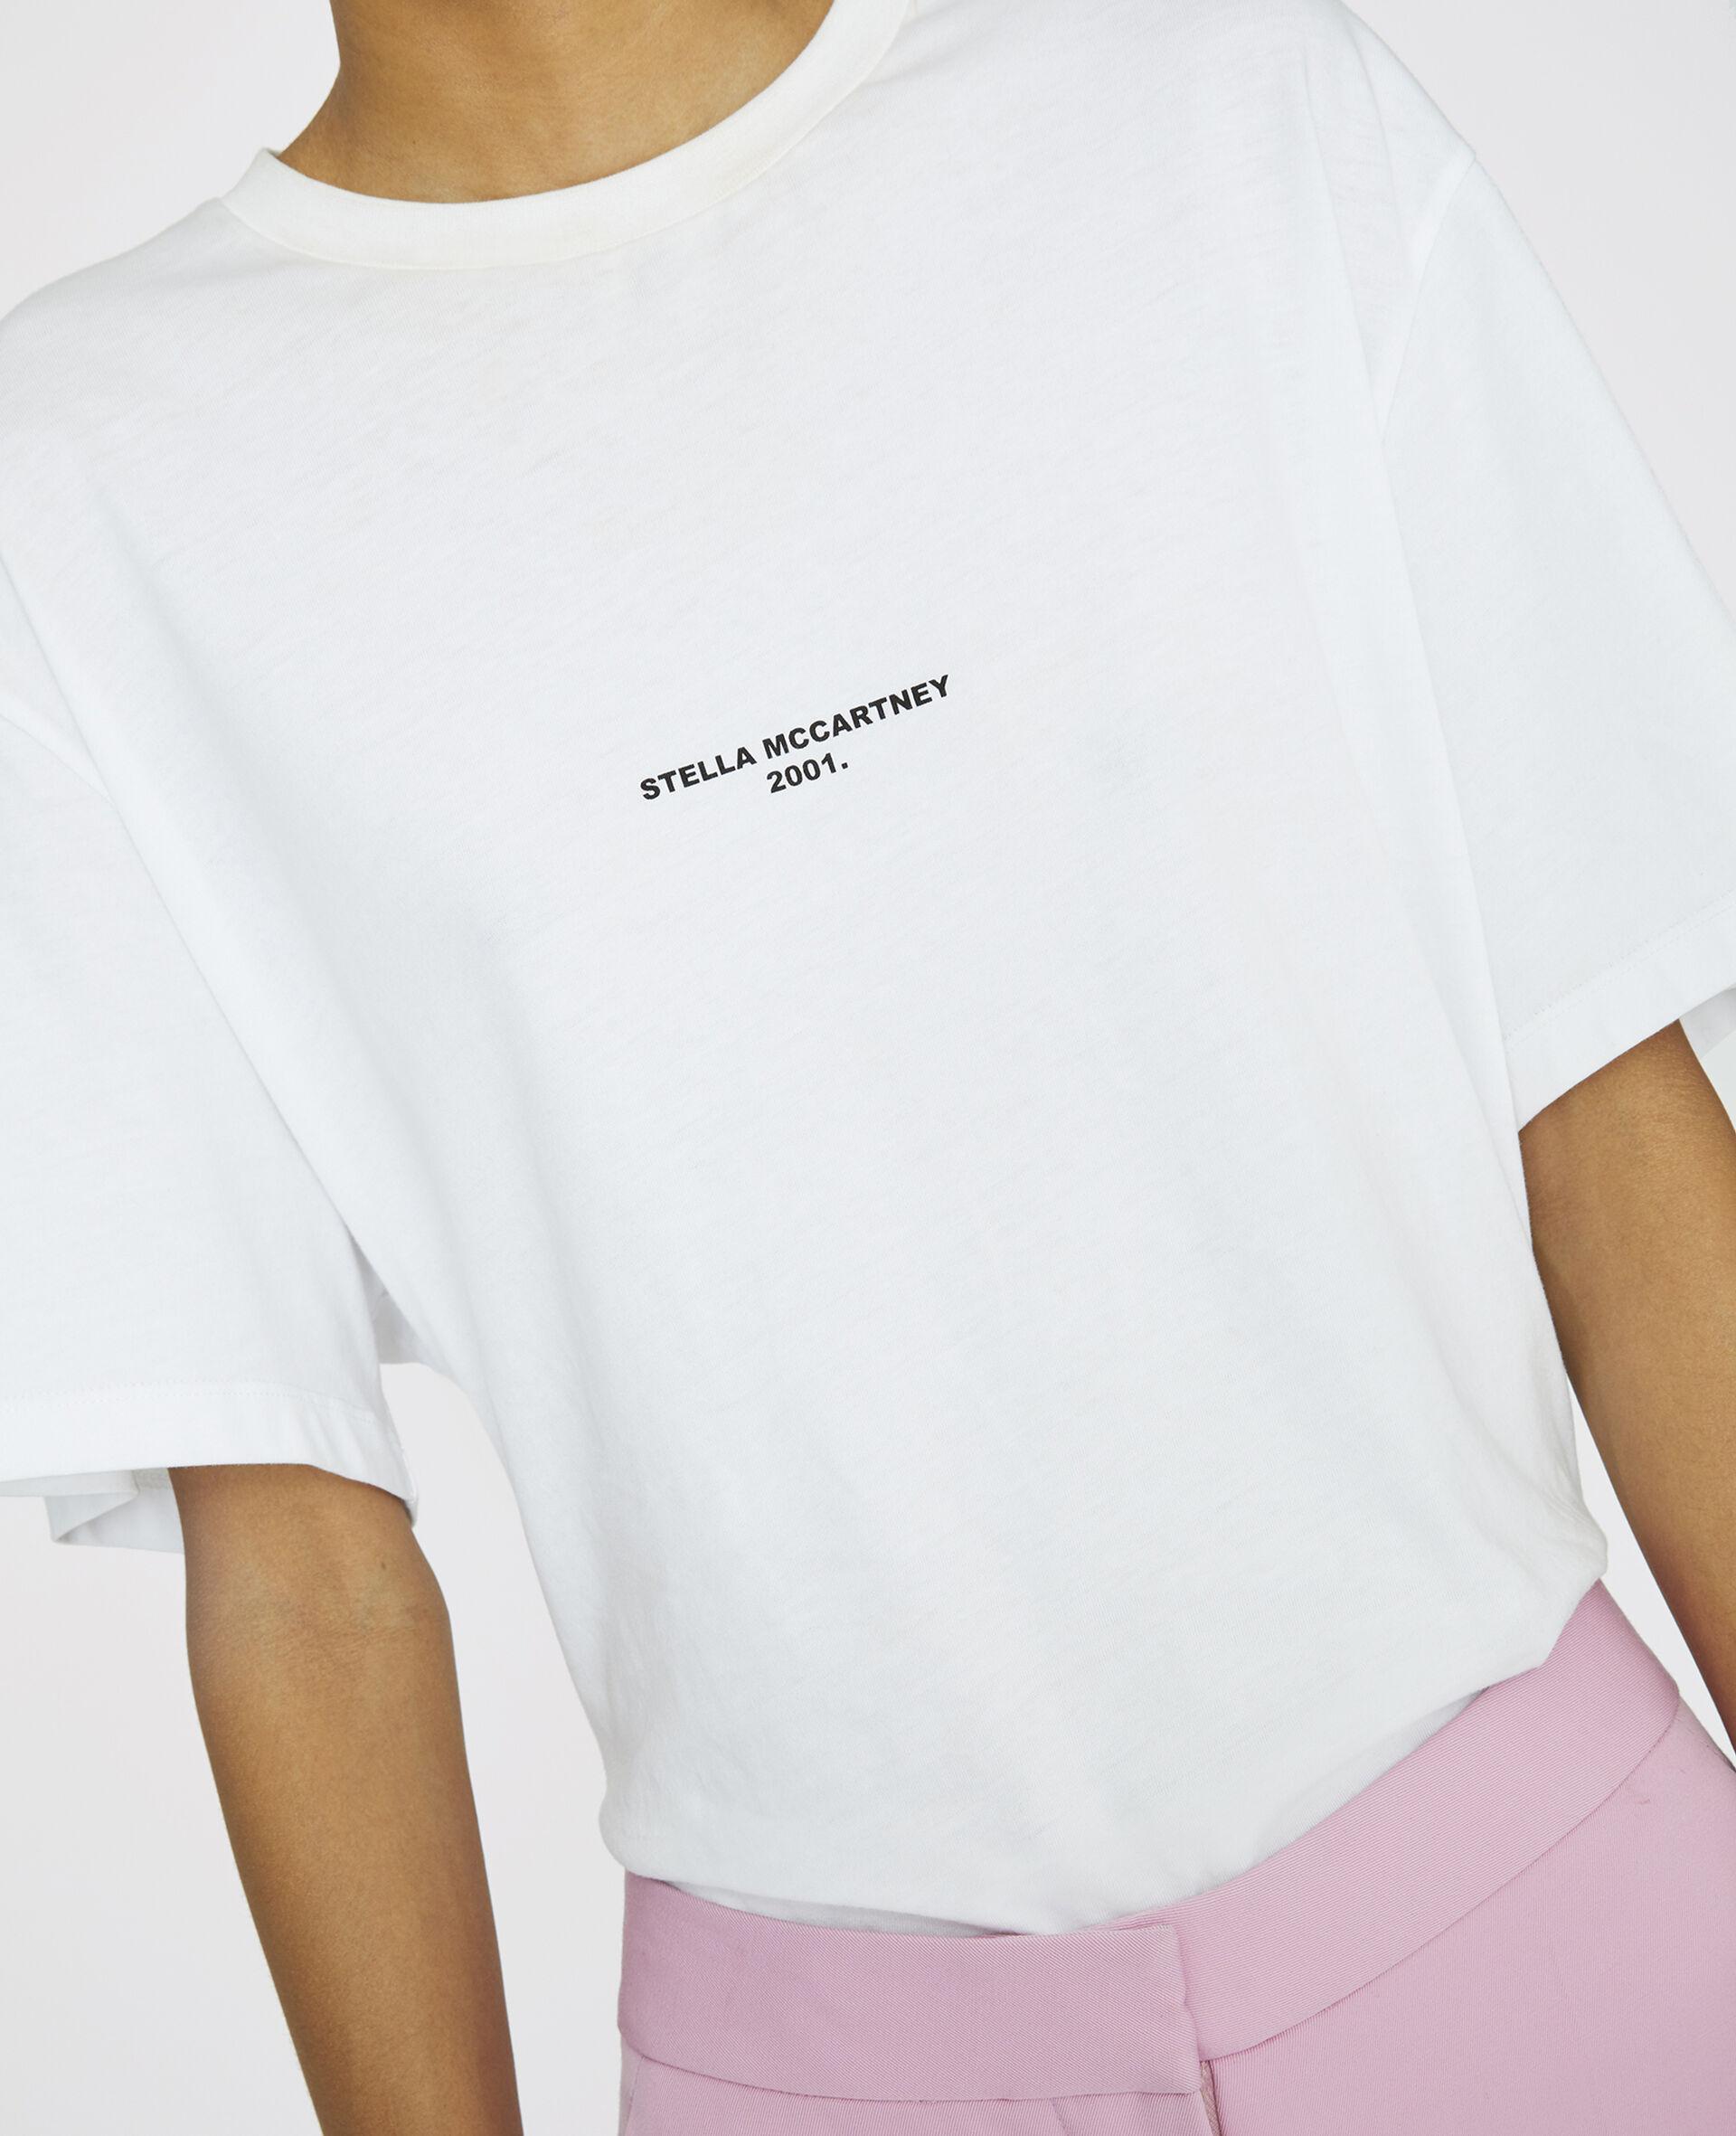 Stella McCartney 2001.T 恤-黑色-large image number 3